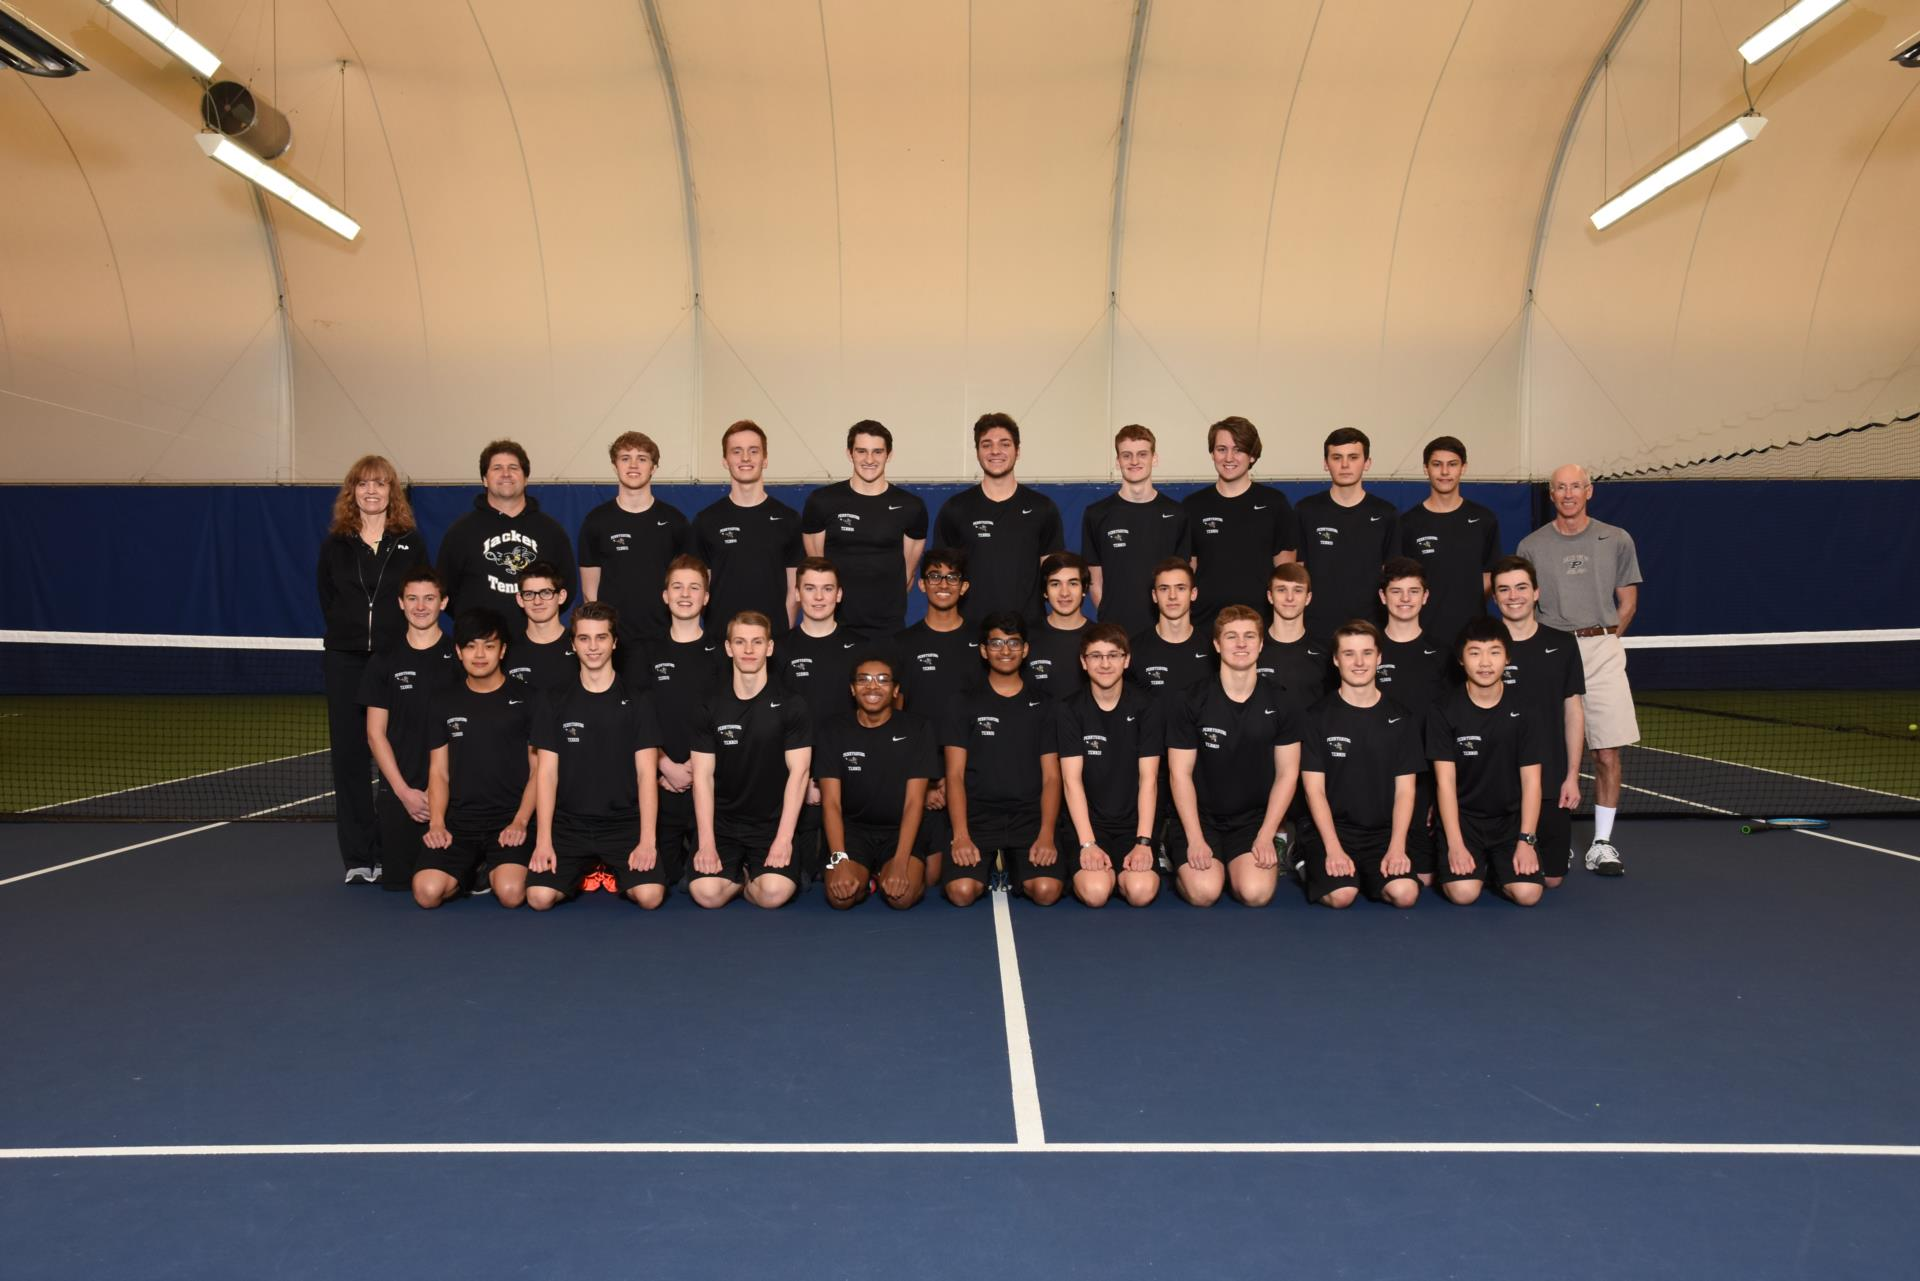 PHS Boys Tennis Team Photo